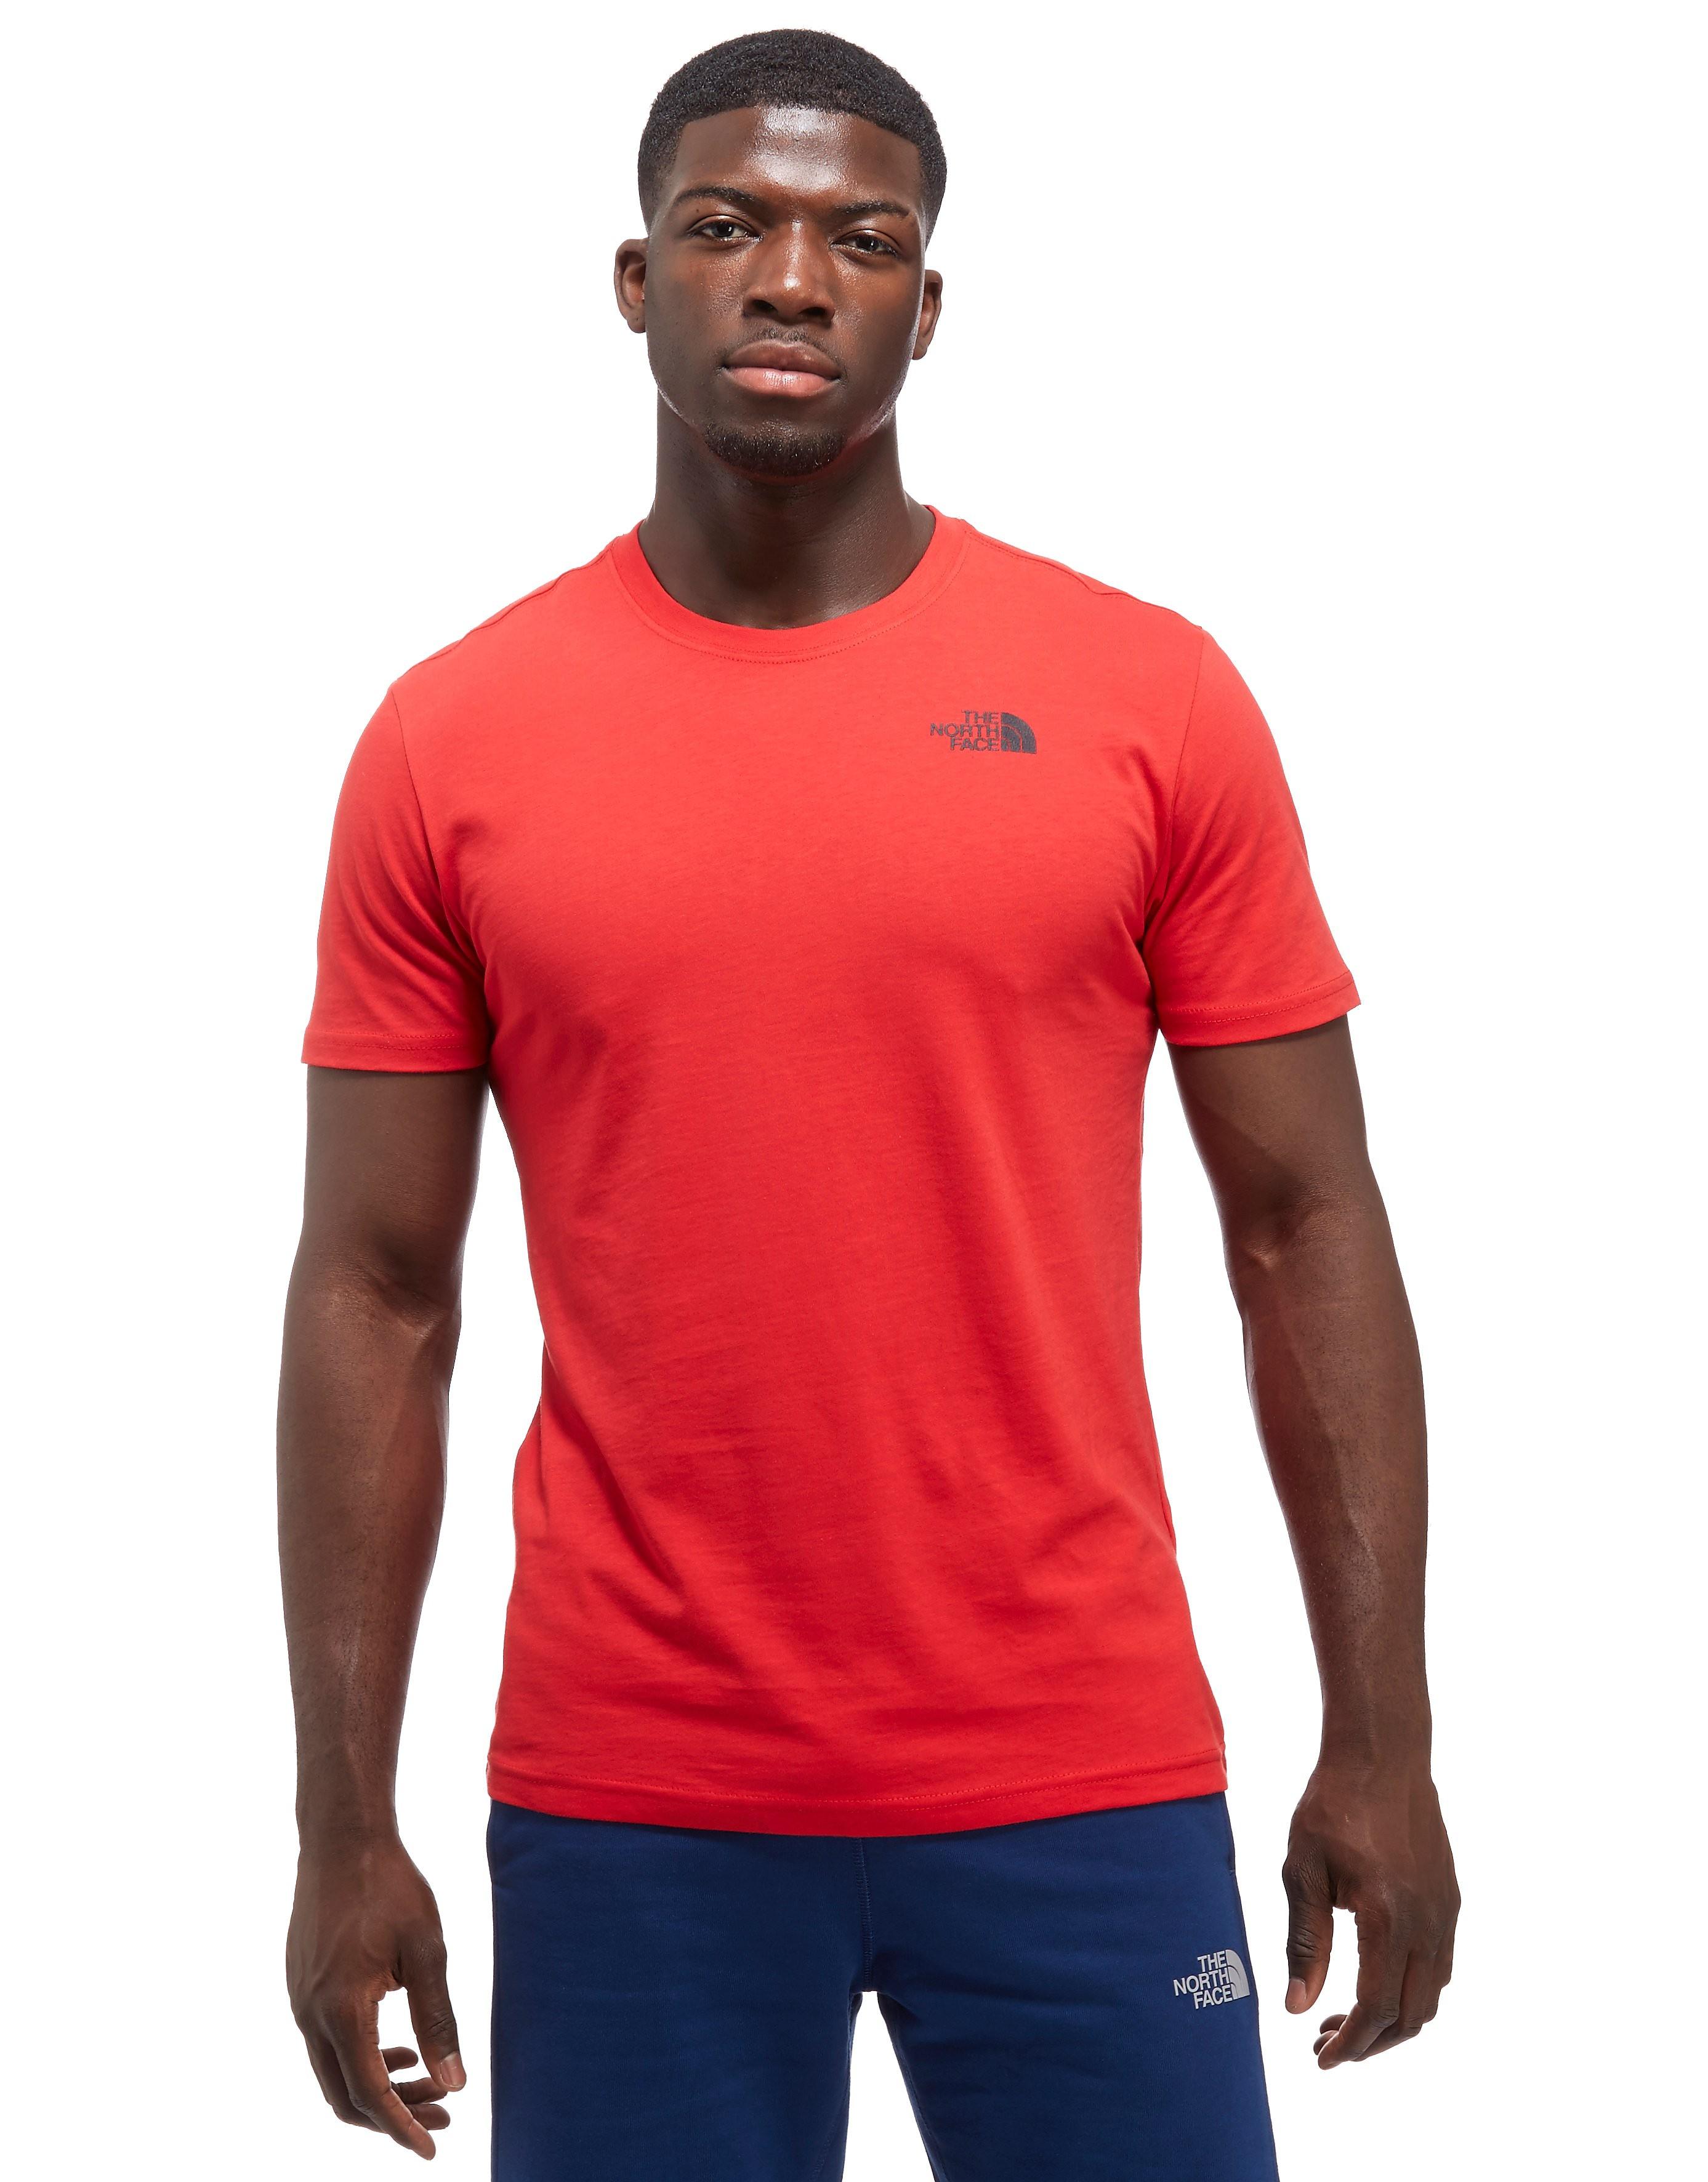 The North Face New Box 17 T-Shirt